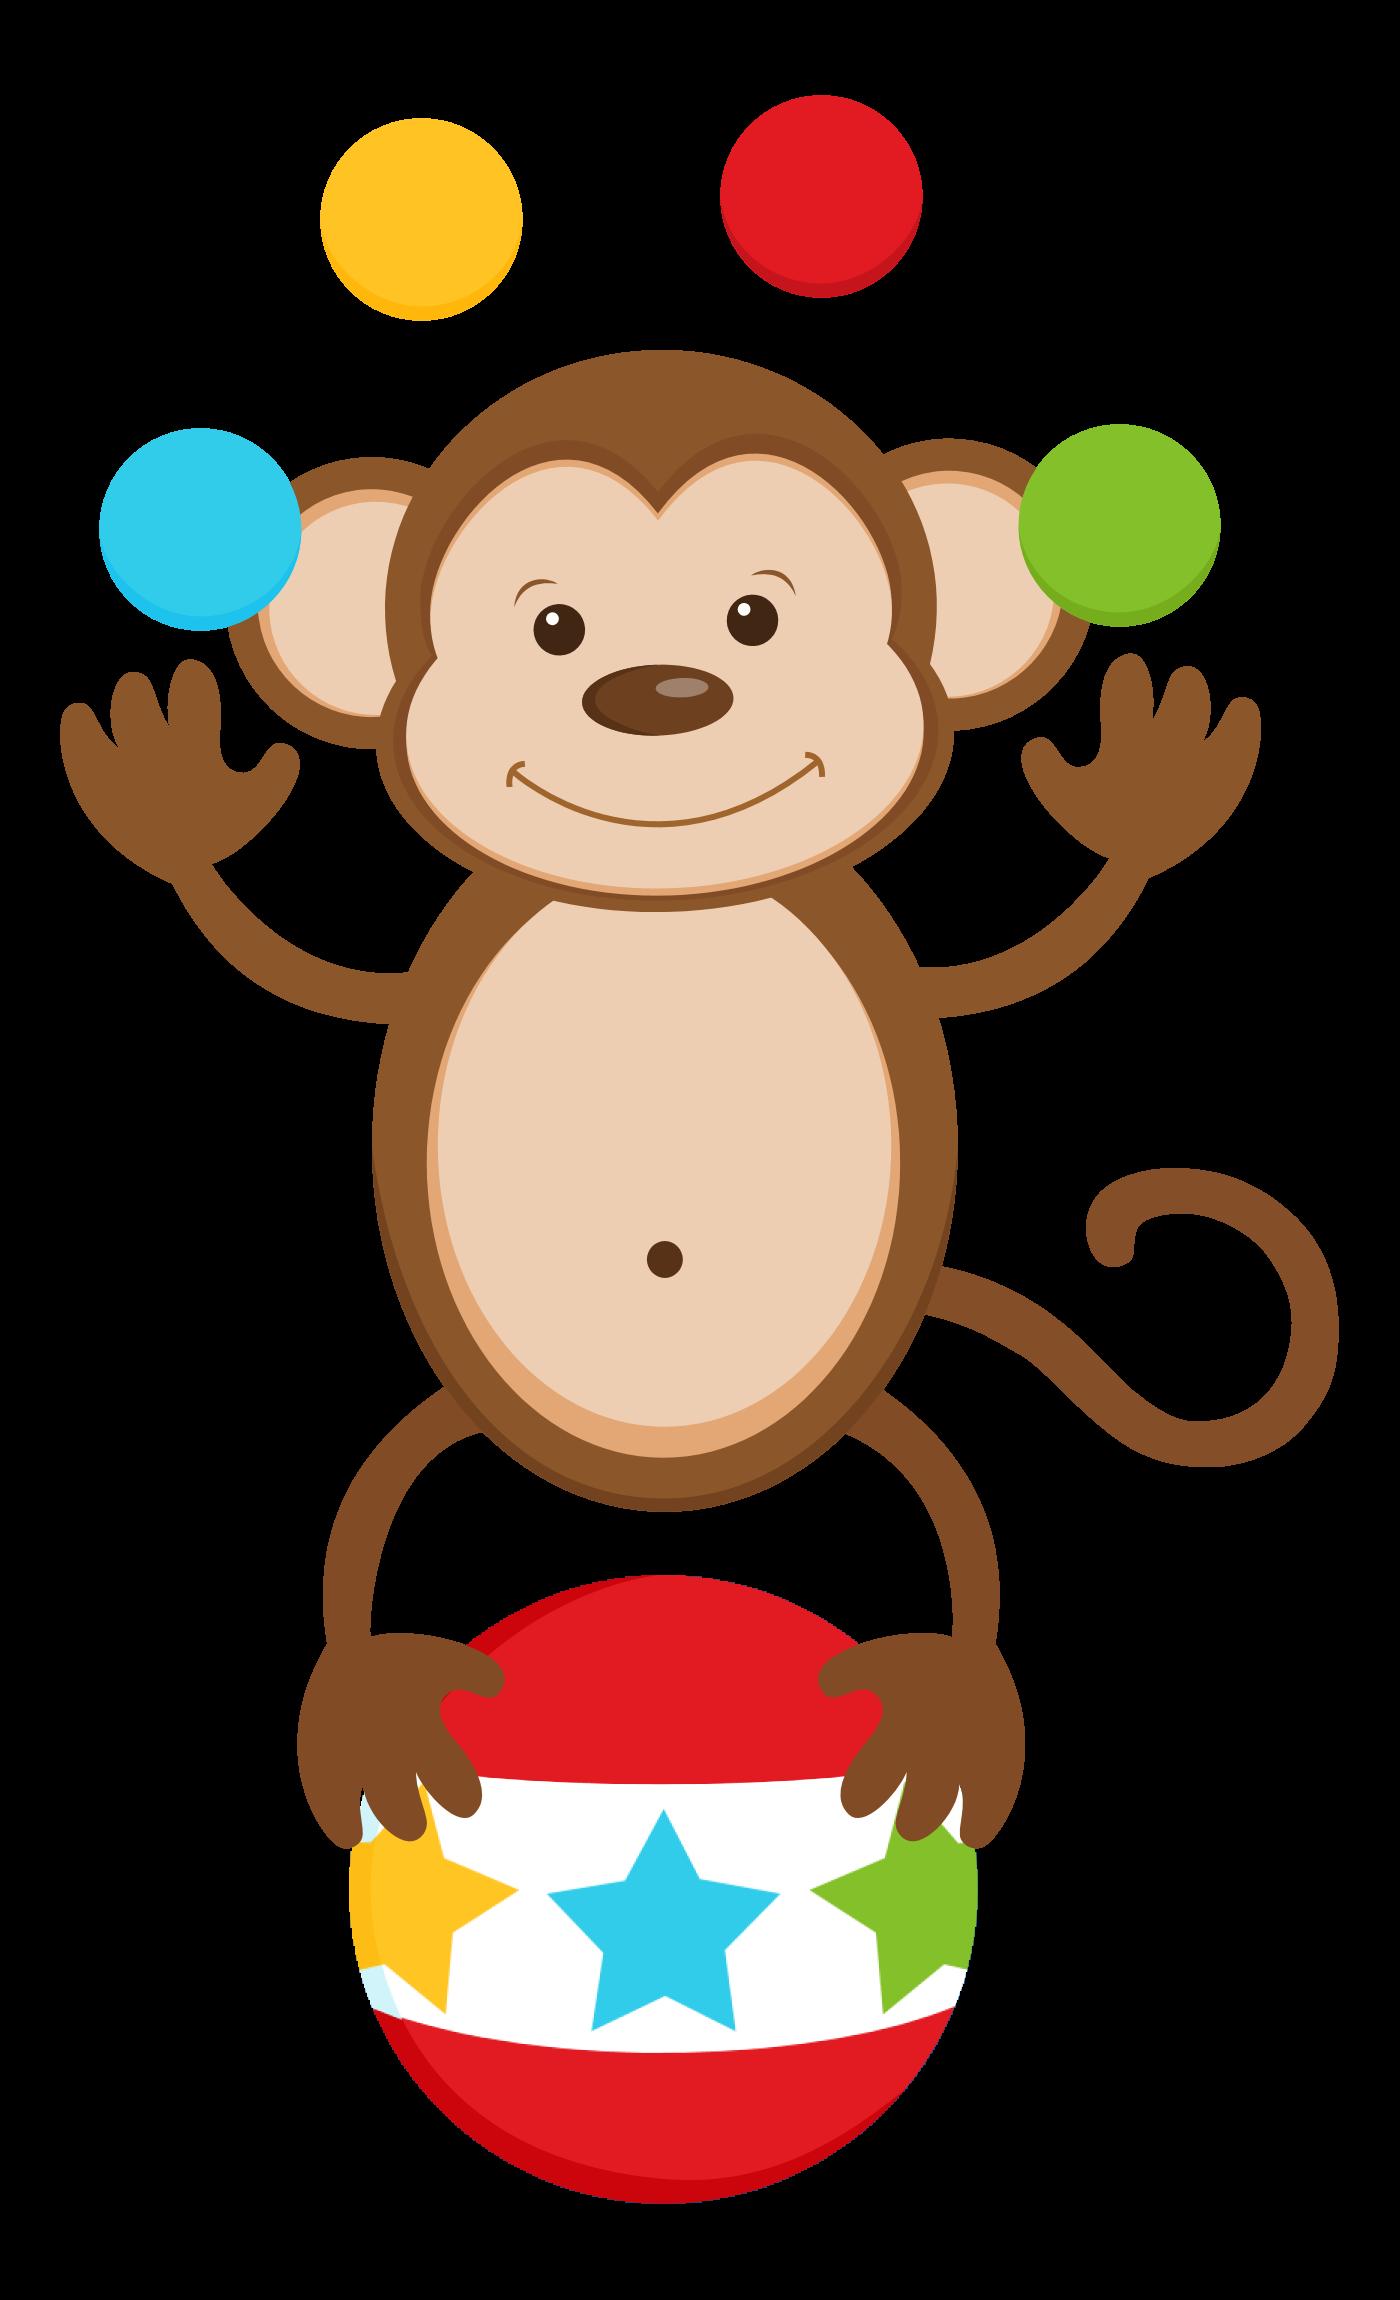 circo png - Pesquisa Google | festa gabriel | Pinterest ...